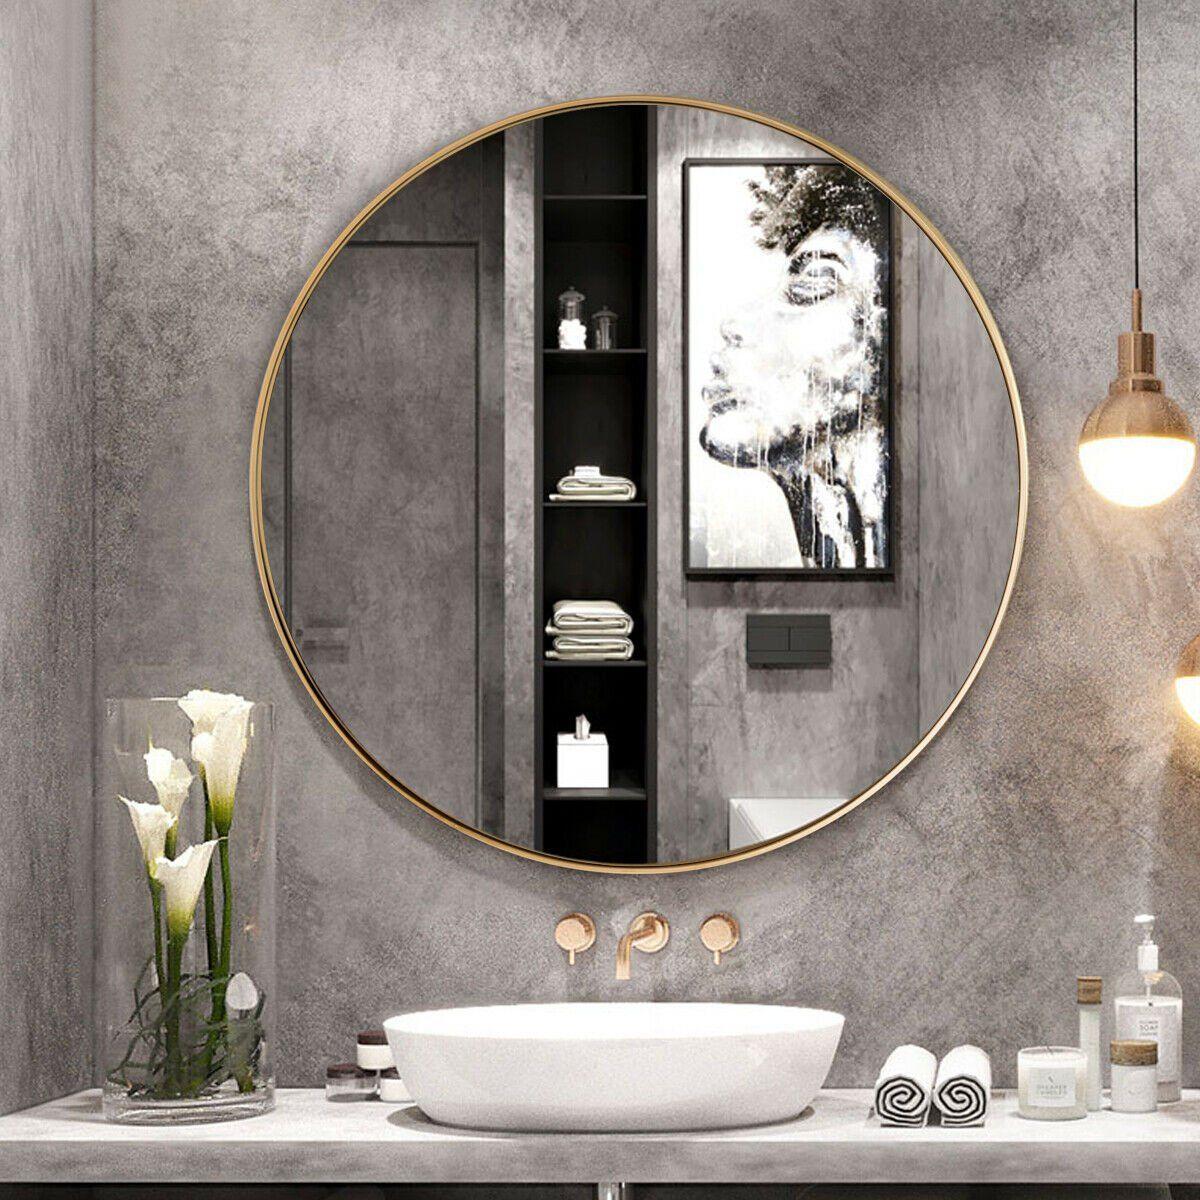 Gymax 27 5 Modern Metal Wall Mounted Round Mirror For Bathroom Entryway Gold Walmart Com In 2021 Round Mirror Bathroom Bathroom Mirror Round Mirrors [ 1200 x 1200 Pixel ]